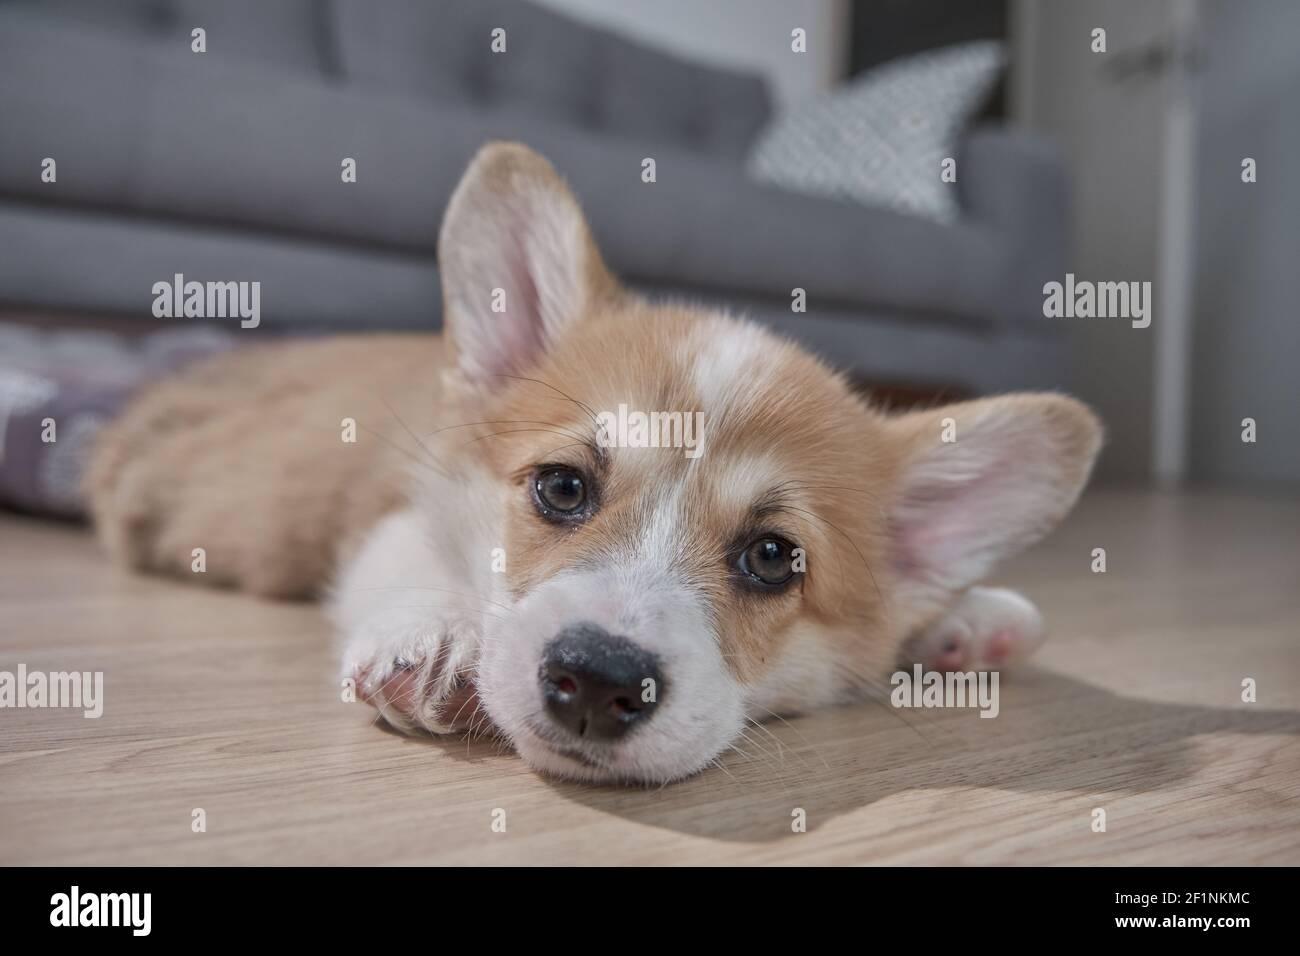 Corgi Puppy Sleep High Resolution Stock Photography And Images Alamy